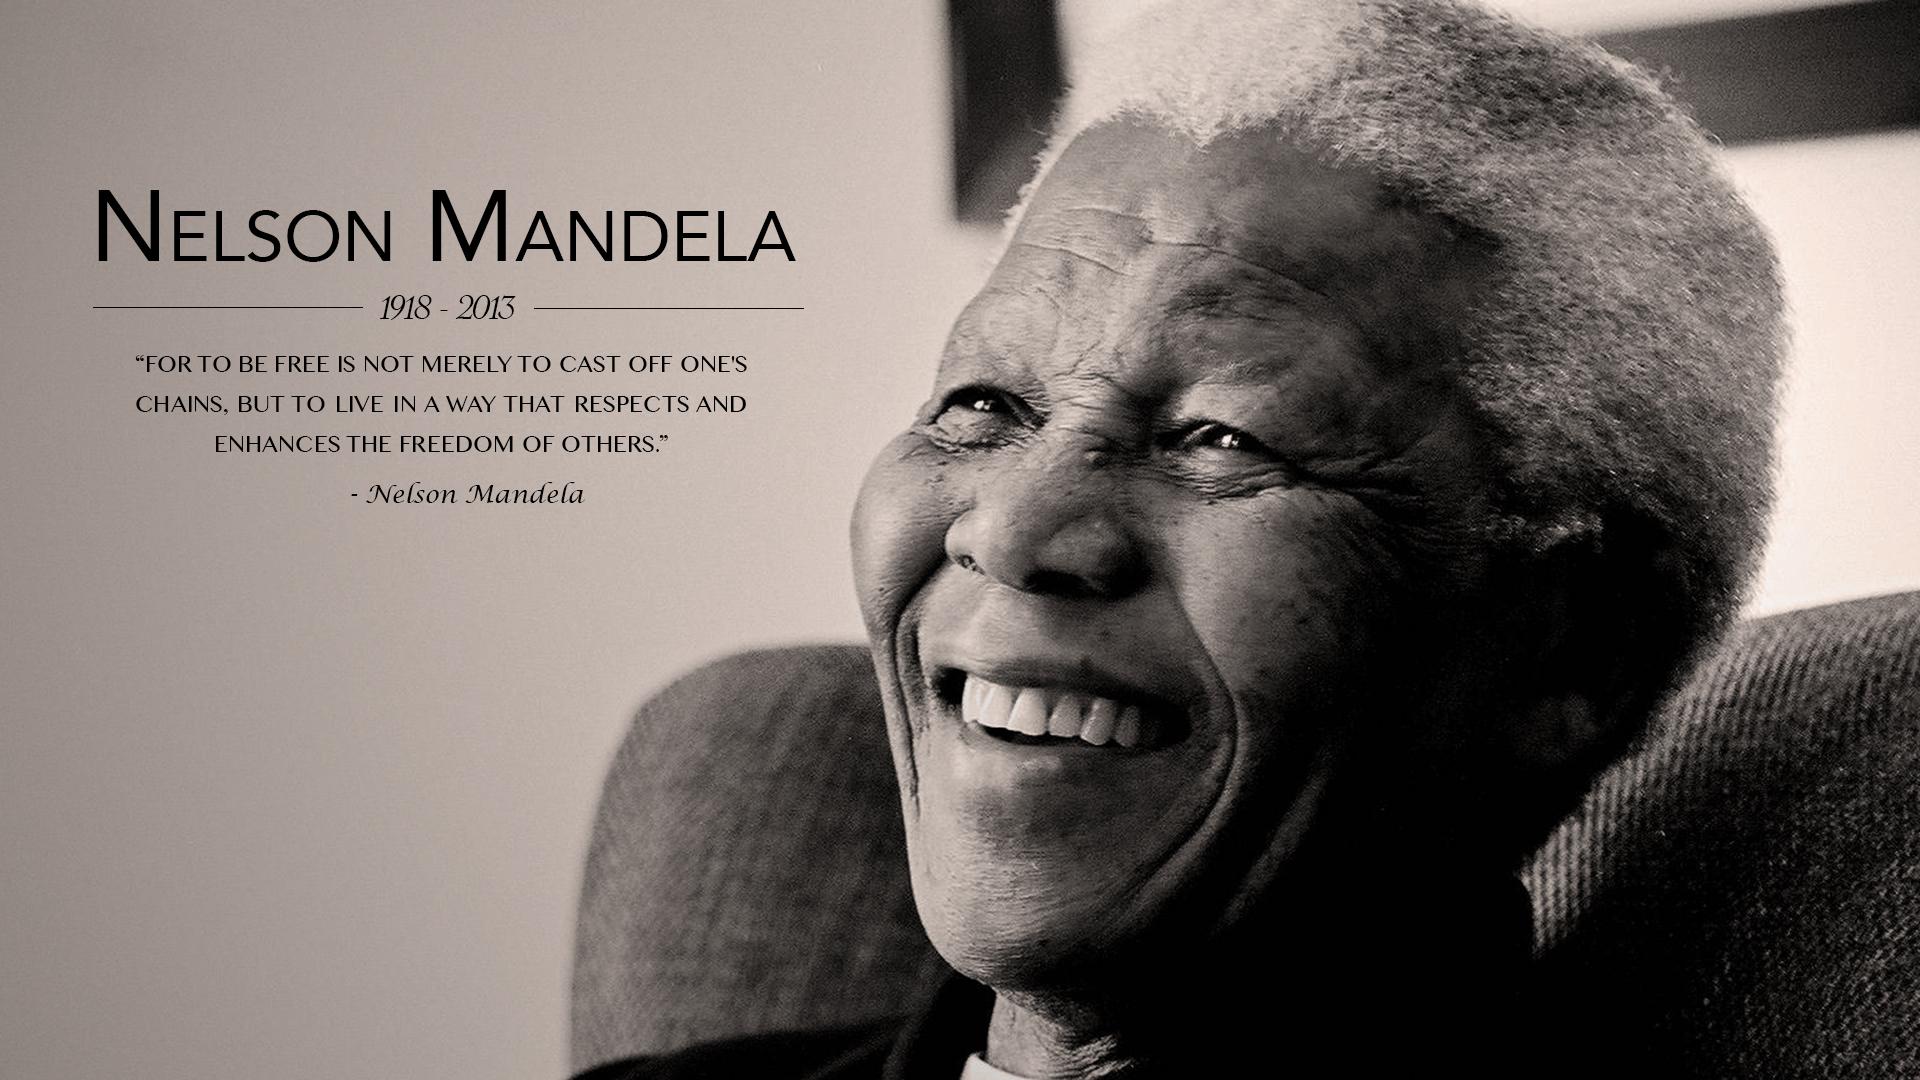 Nelson Mandela iReever Mandela Tribute